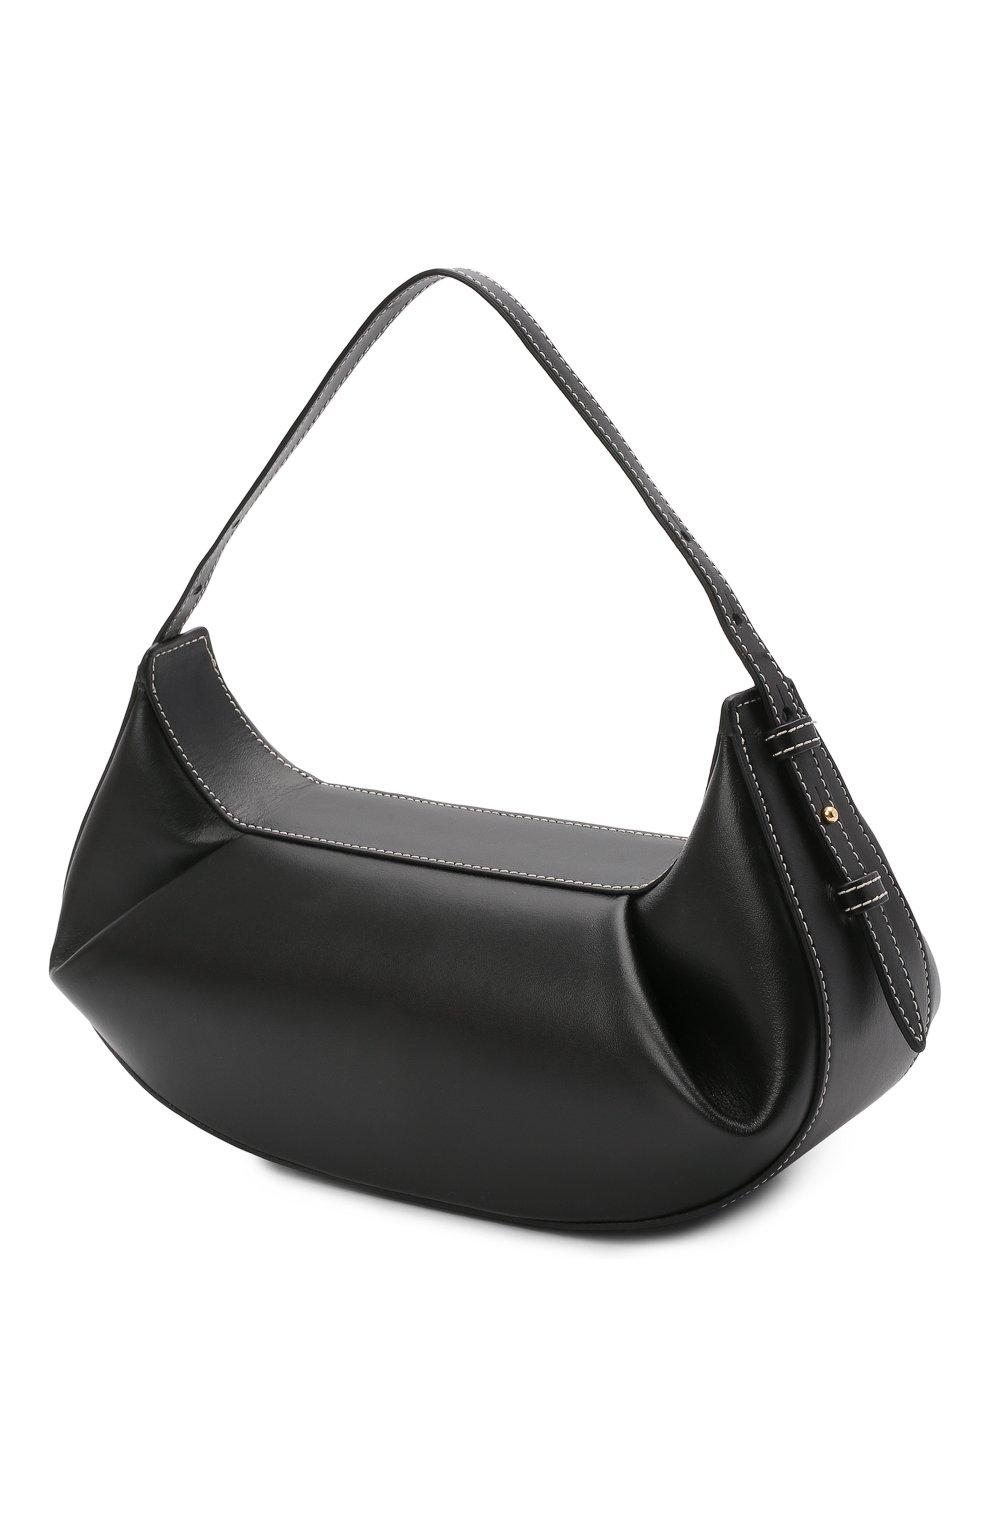 Женская сумка fortune cookie YUZEFI черного цвета, арт. YUZC0-HB-FC-00   Фото 3 (Сумки-технические: Сумки top-handle; Размер: medium; Материал: Натуральная кожа)